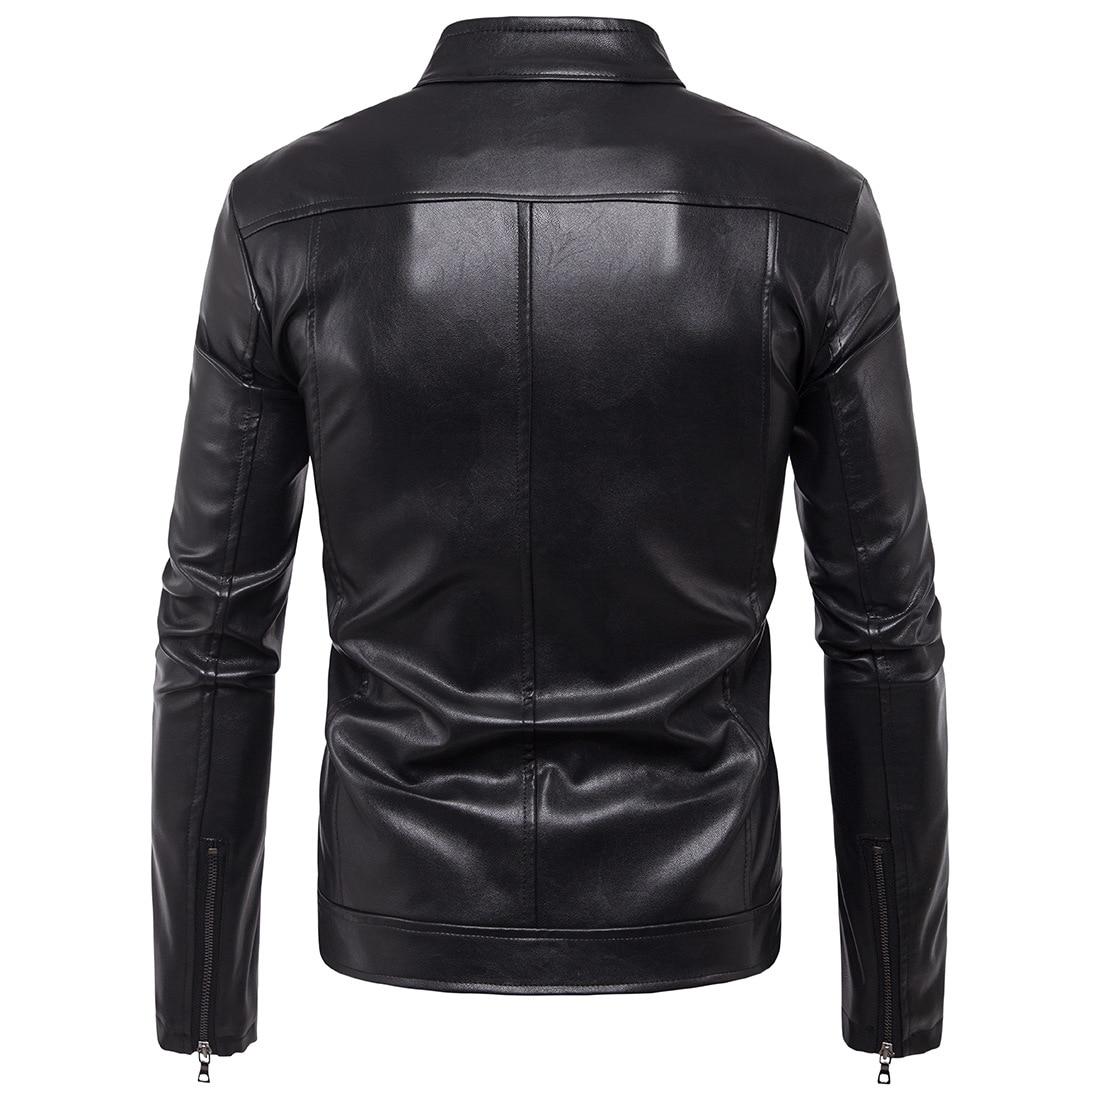 Ouma 2019 New Style Men Locomotive Rivet Leather Coat Handsome Leather Jacket Coat For B007